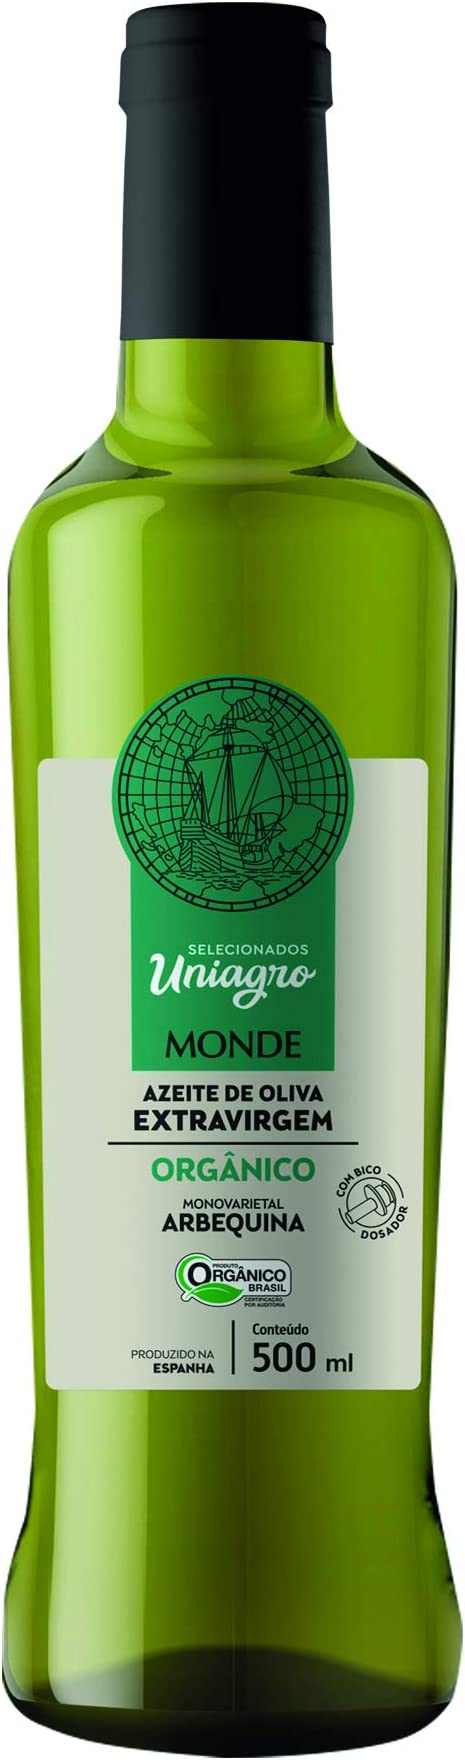 Azeite de Oliva Extra Virgem Organico 500 Ml